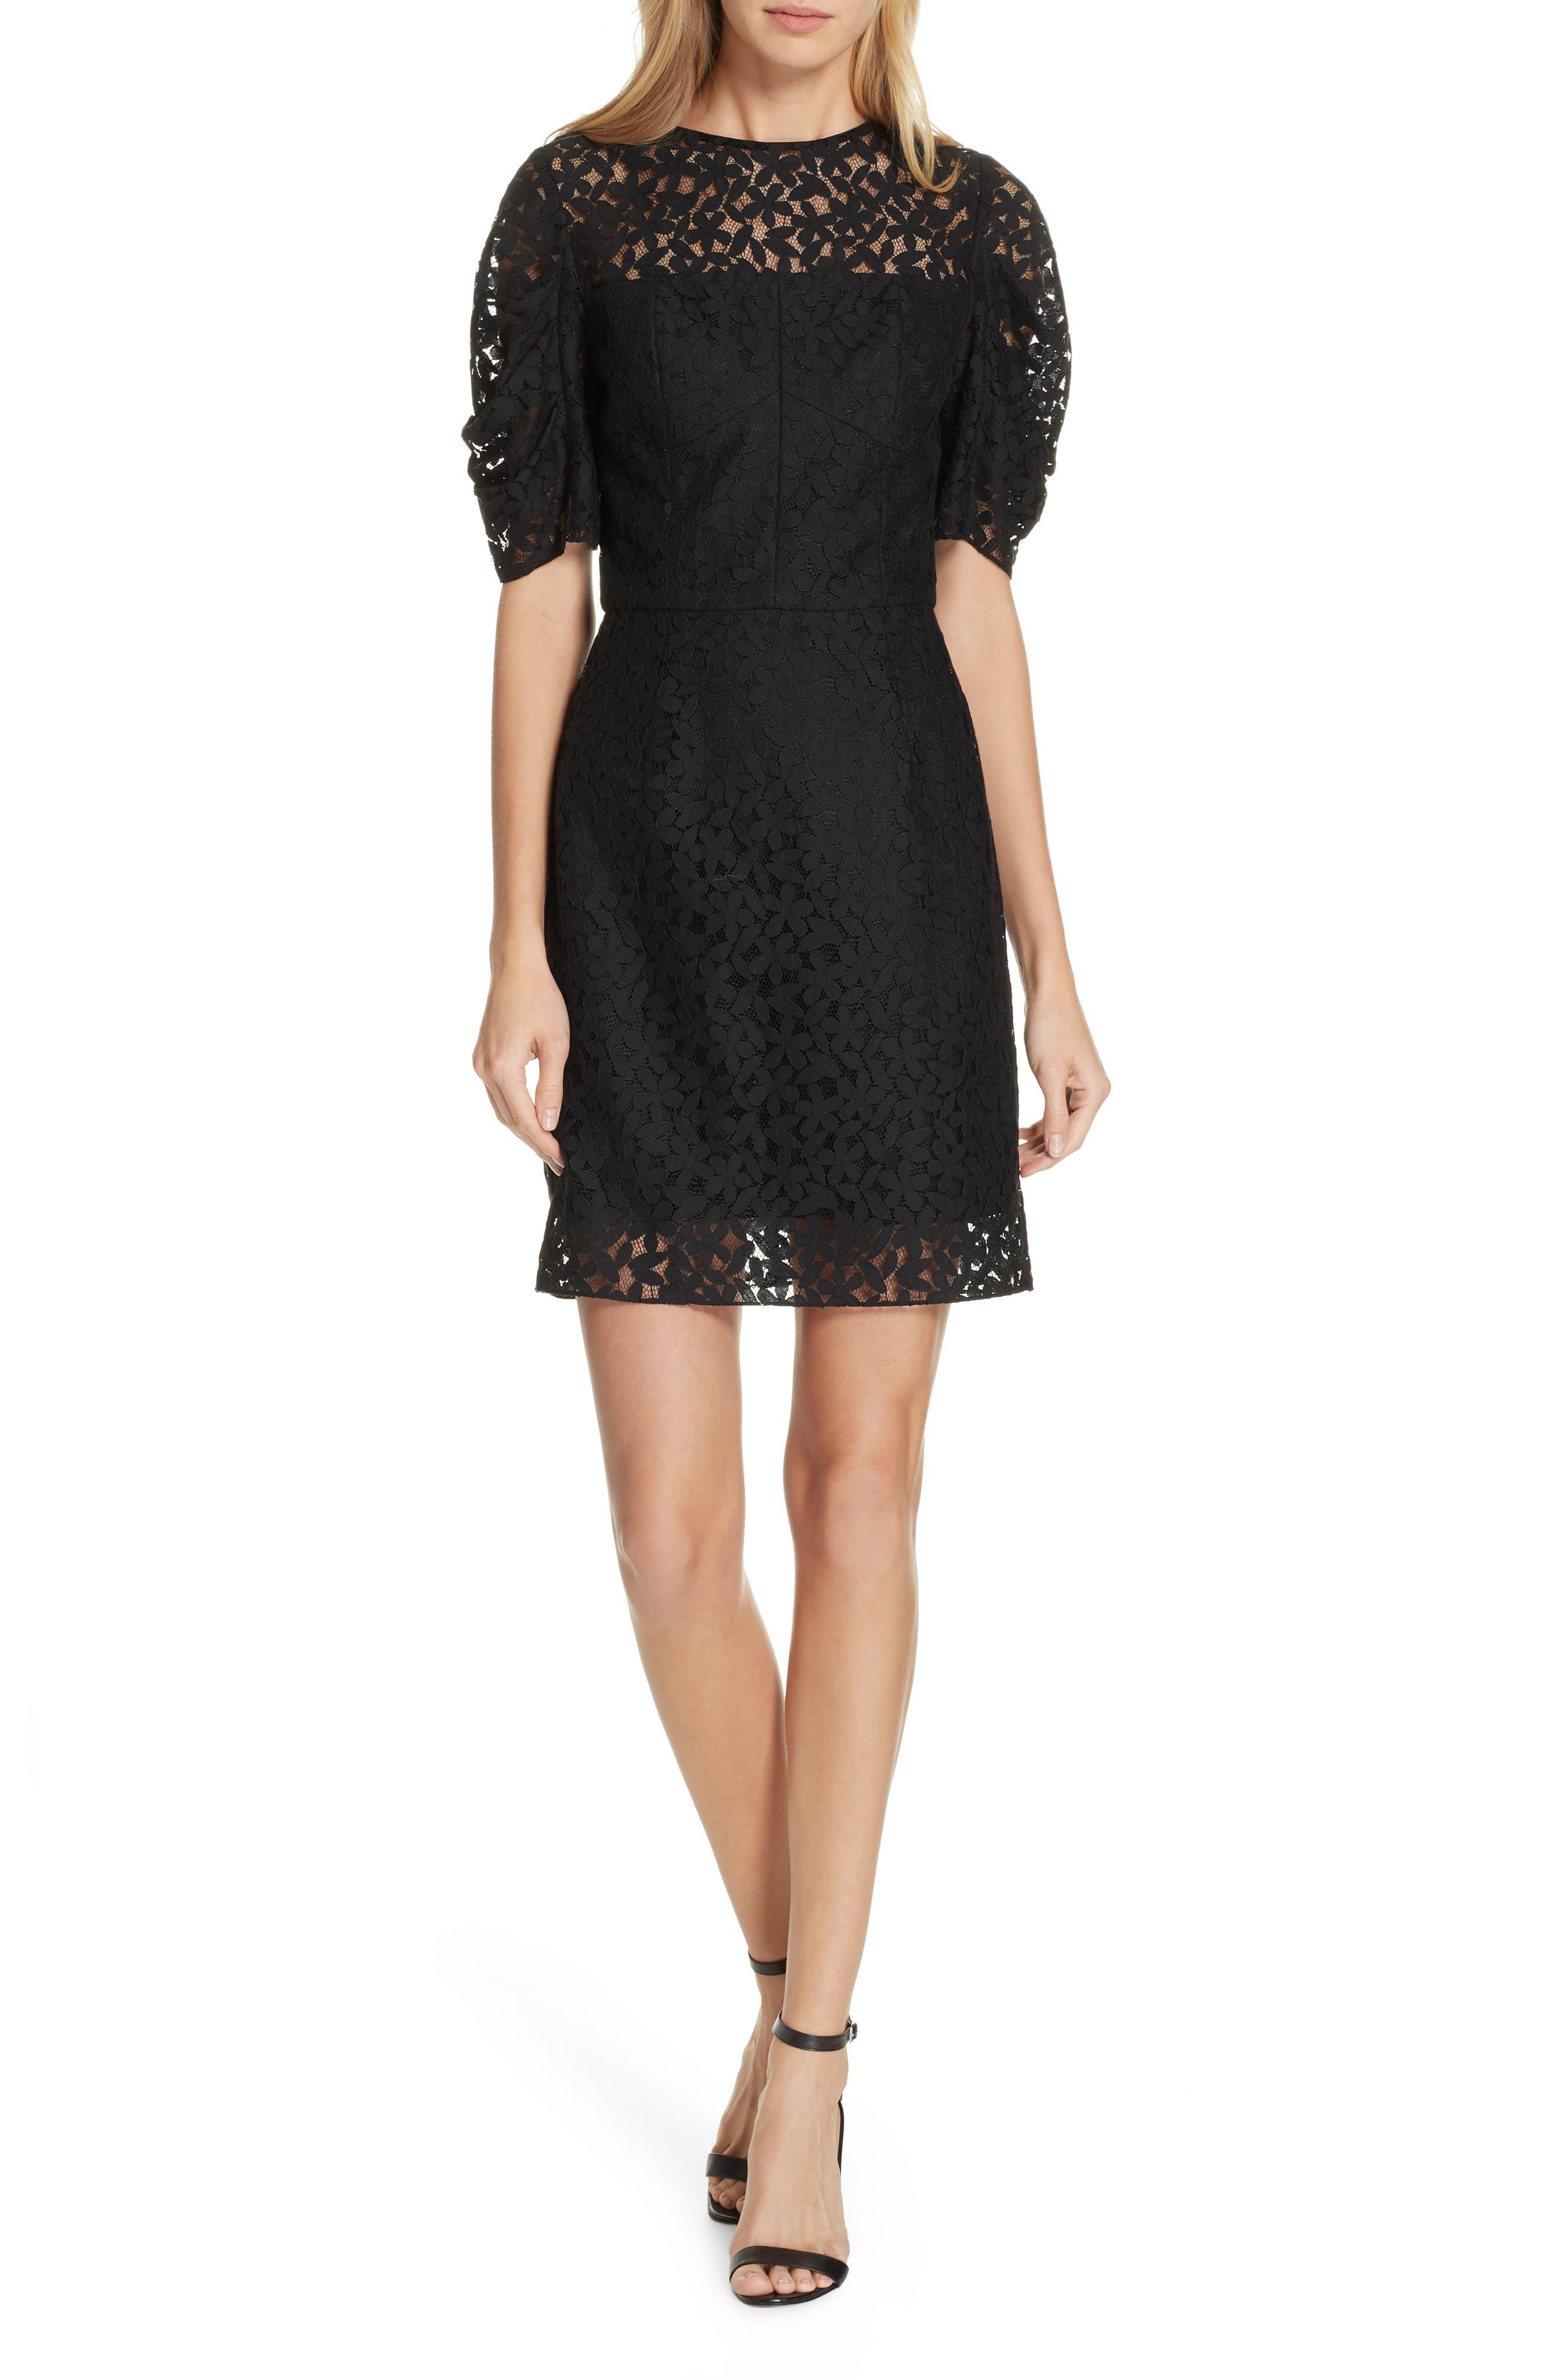 Milly Kara Lace Sheath Dress, Black